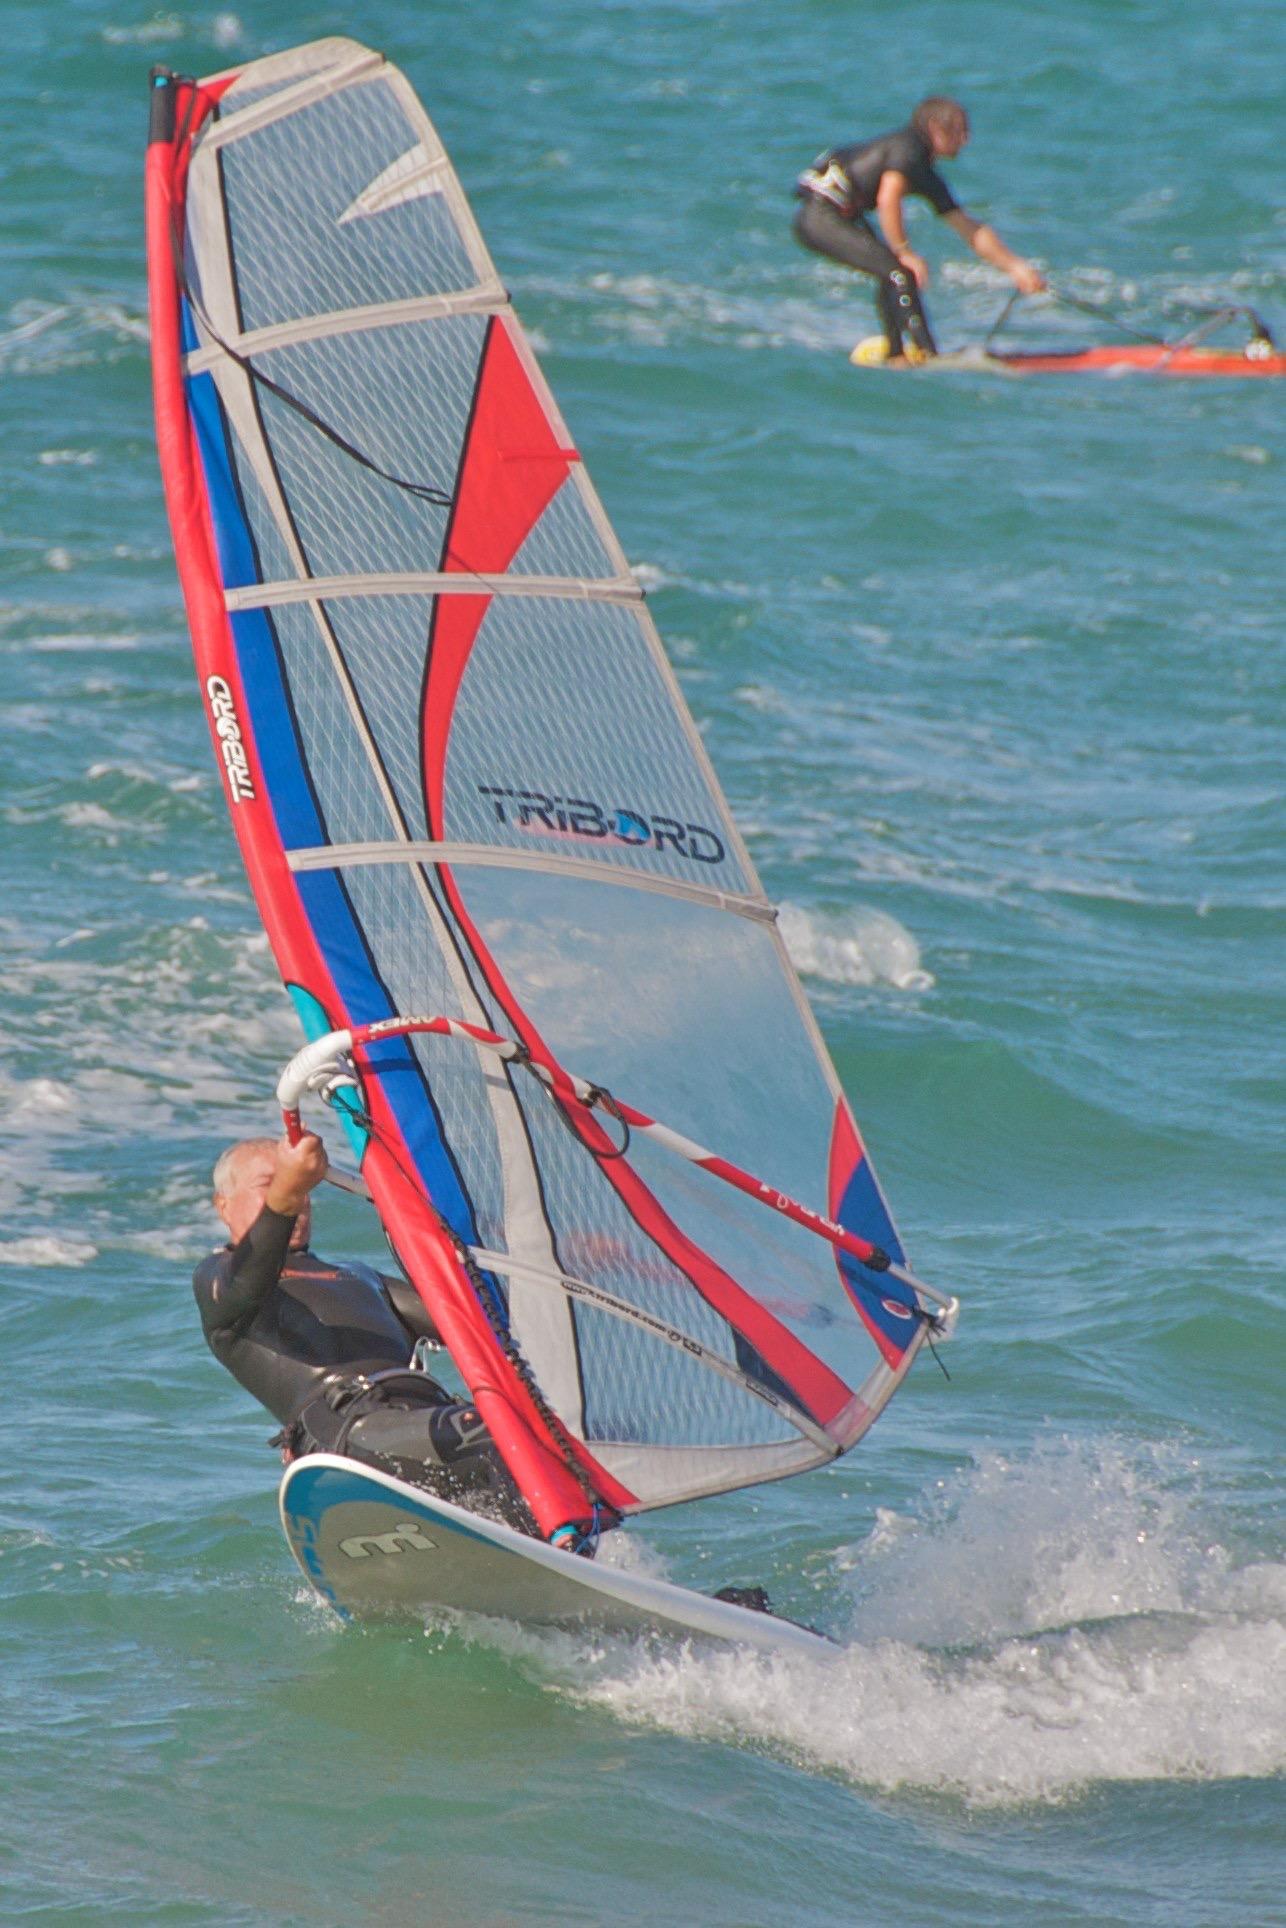 Porto Pollo - Sardinia's surfing capital